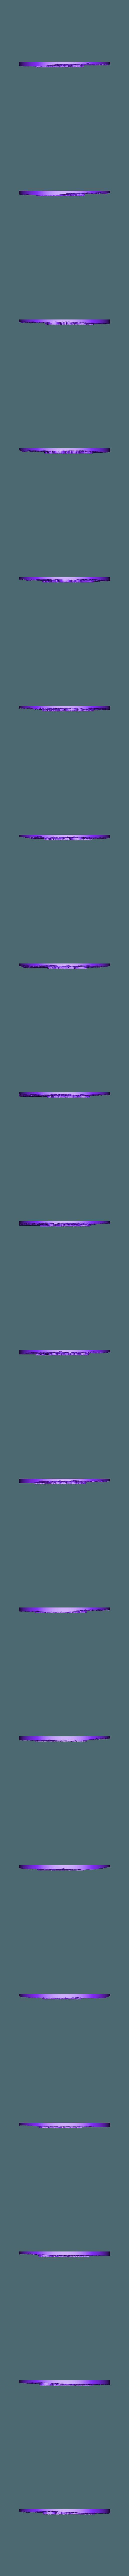 Luna_E.T2.stl Download free STL file E.T. across the moon litophane • 3D print template, dancingchicken